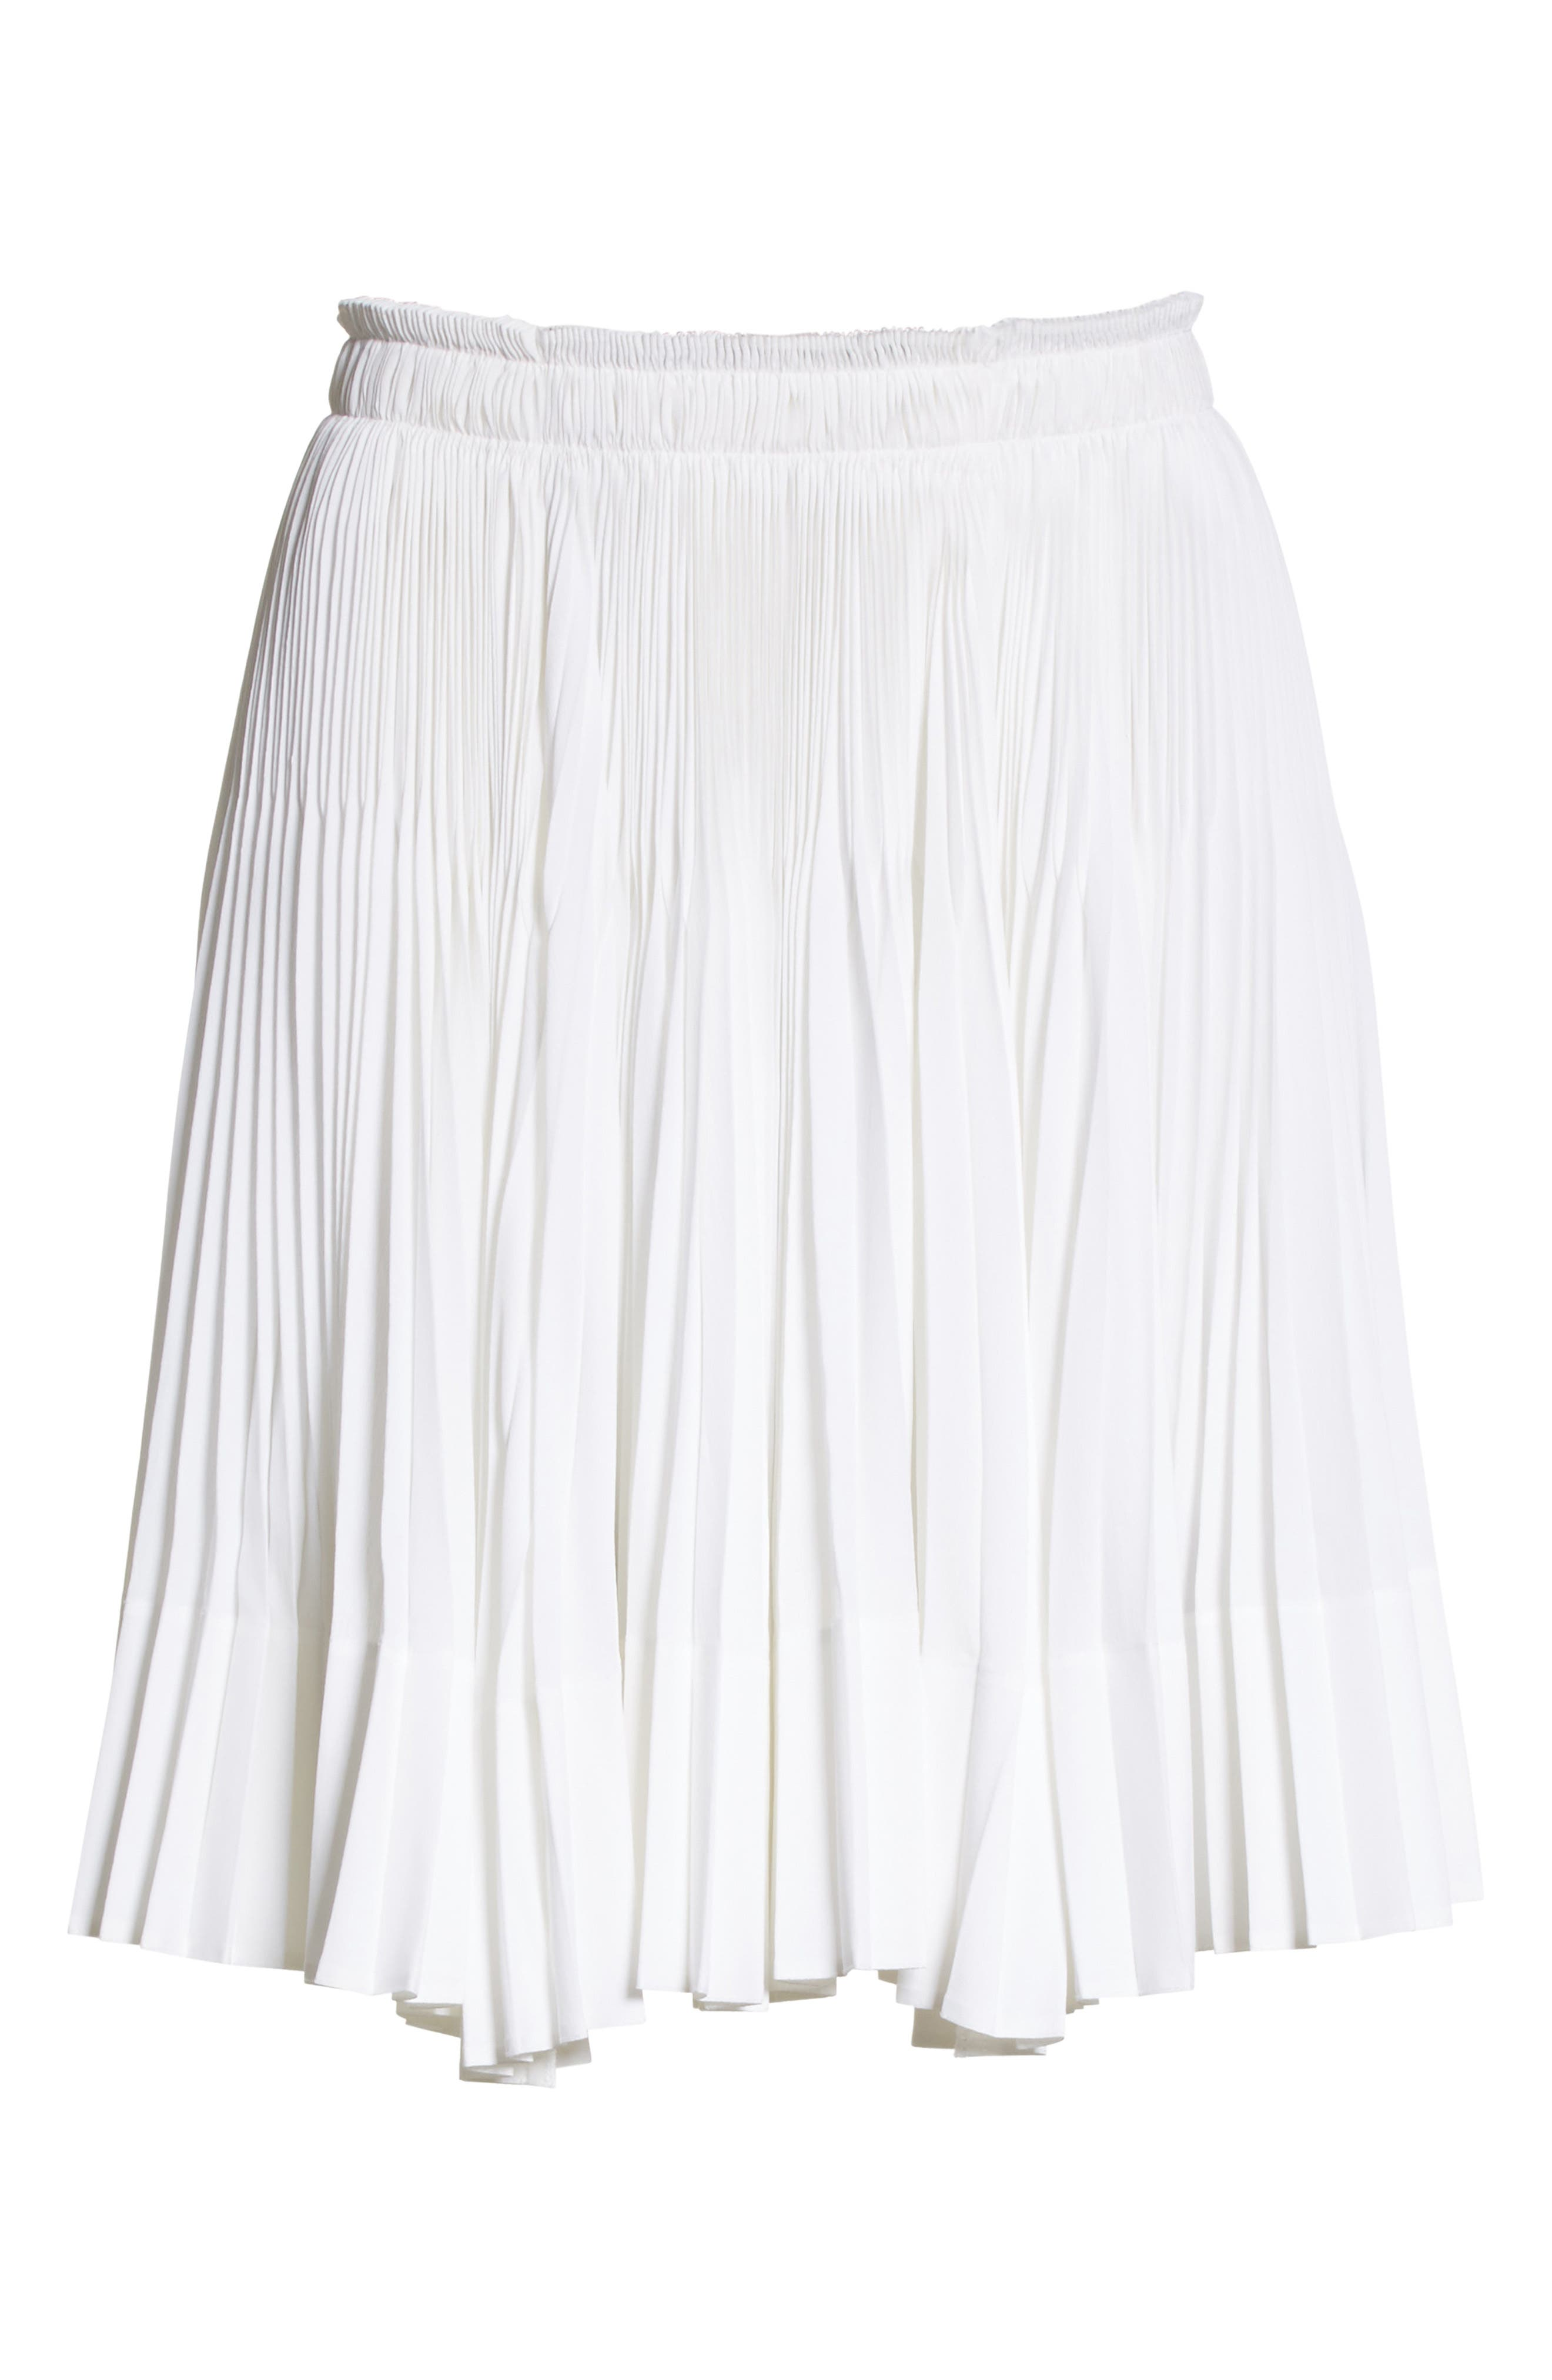 VINCE,                             Multi Pleat Skirt,                             Alternate thumbnail 6, color,                             137